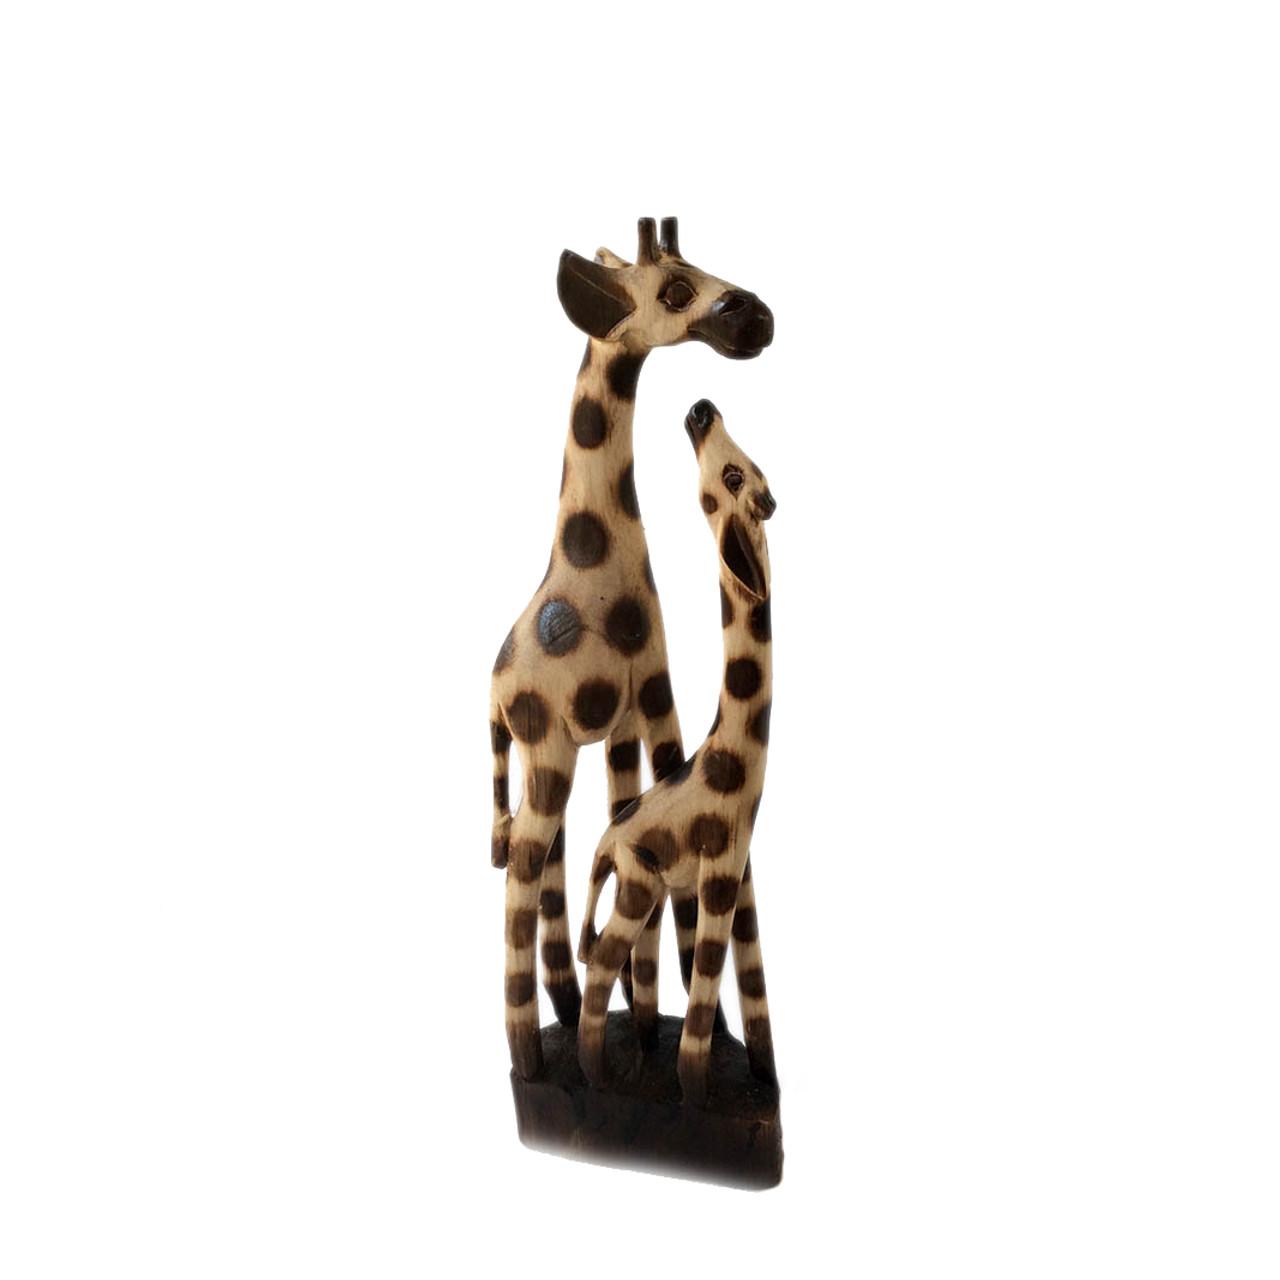 Mother Baby Wooden Giraffes Fair Trade Present Company